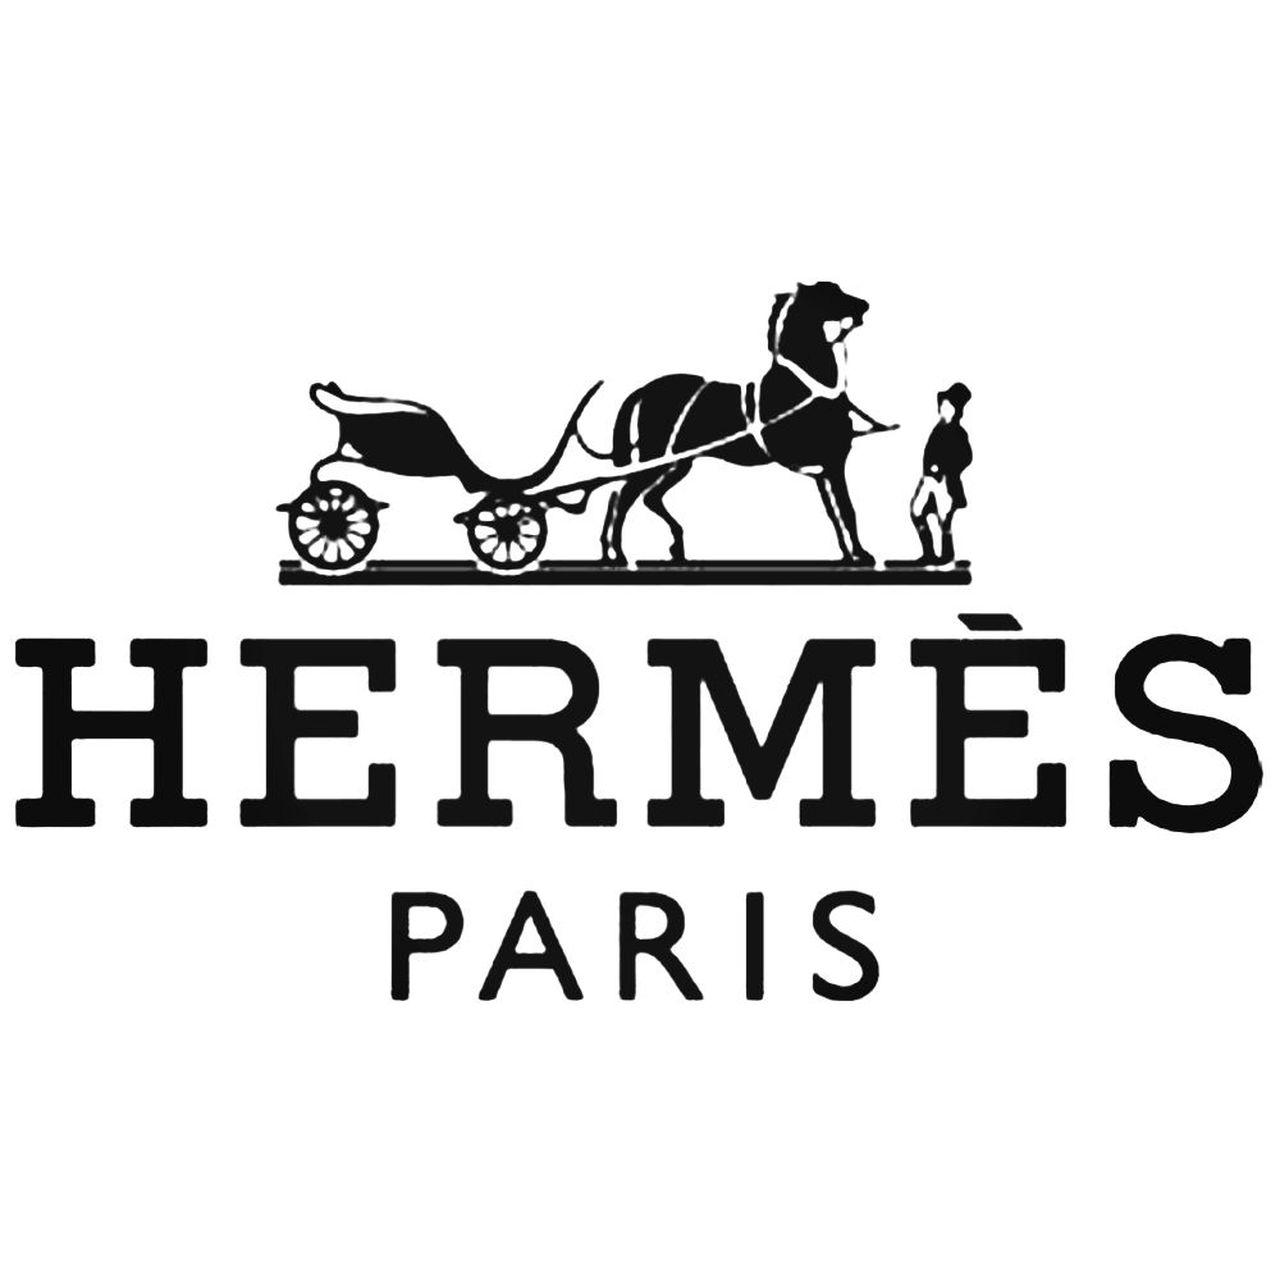 Hermes-Logo-Decal-Sticker__53440.1510913981 (1)